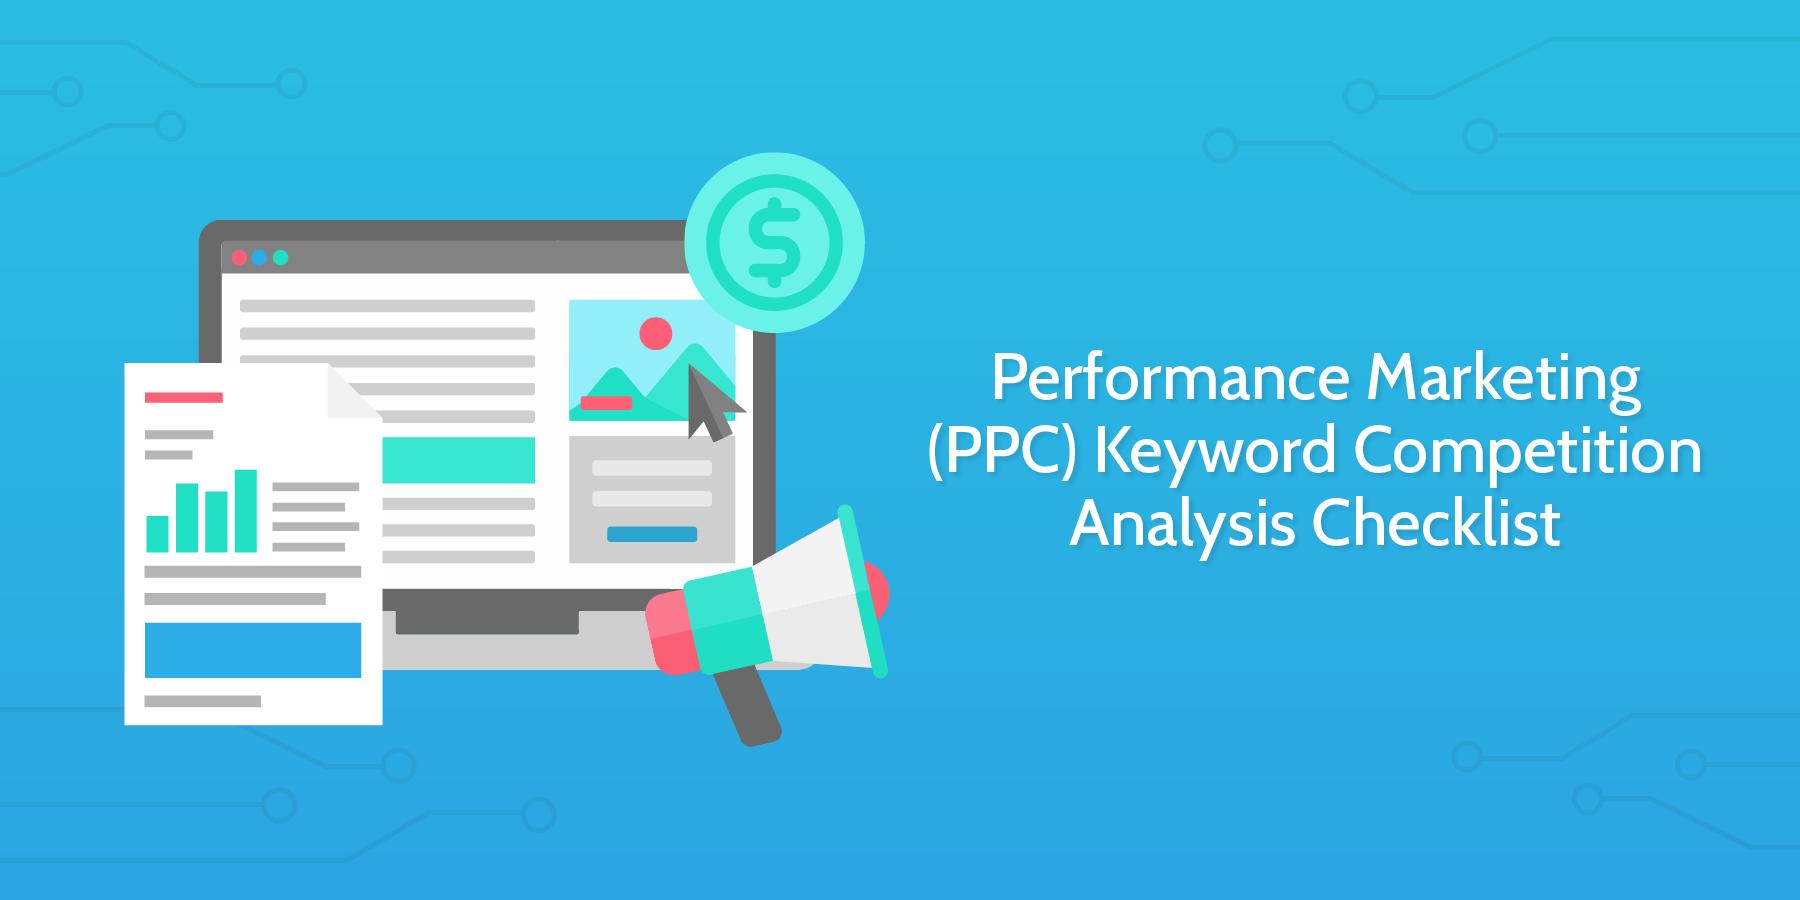 Performance Marketing Keyword Competition Analysis Checklist